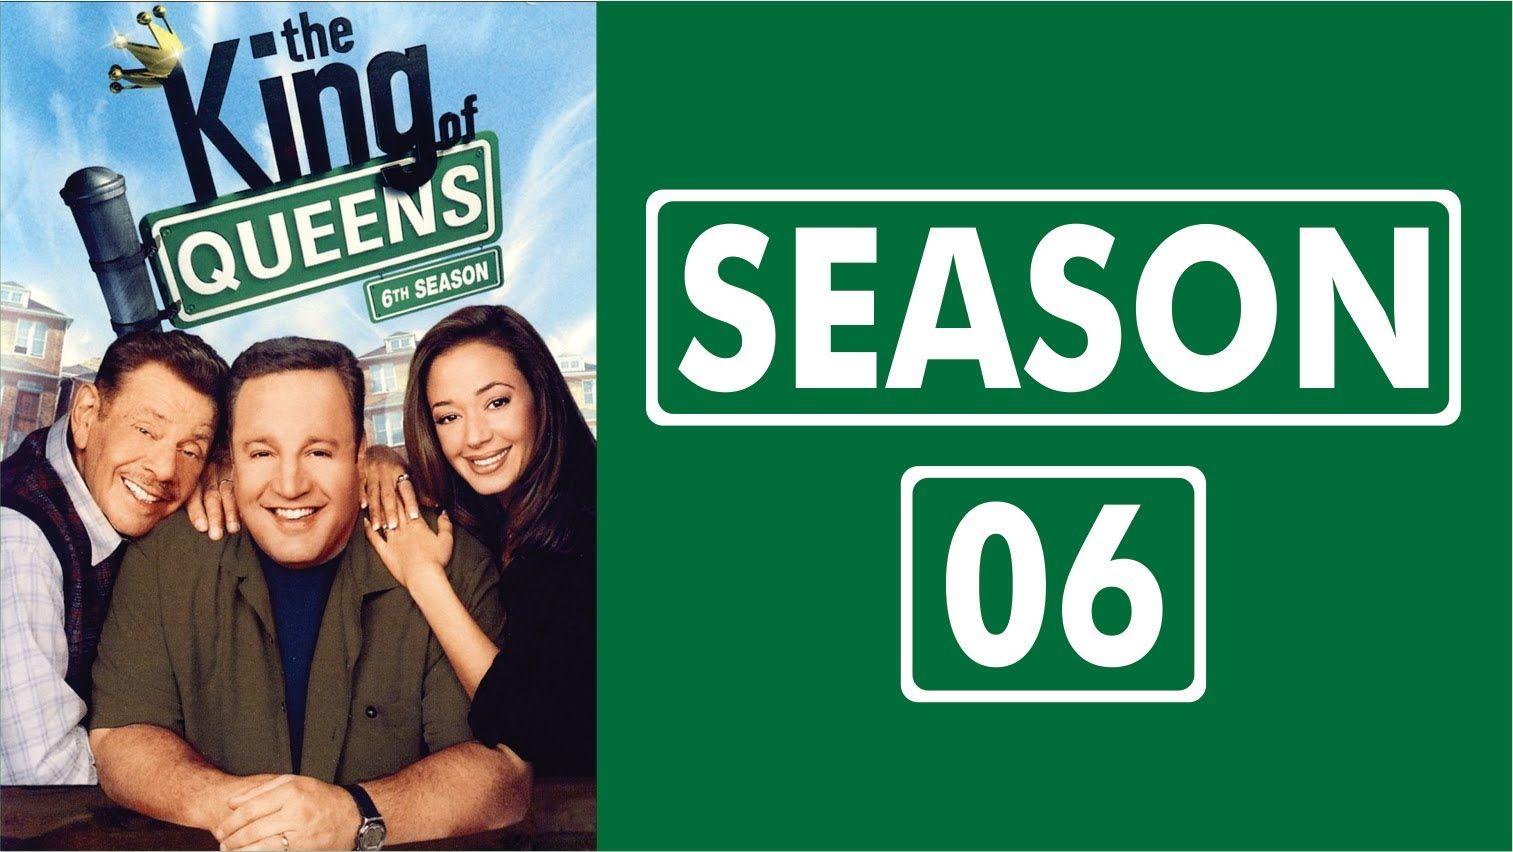 King of Queens Season 6 Episode 11 Santa Claustrophobia | Christmas ...